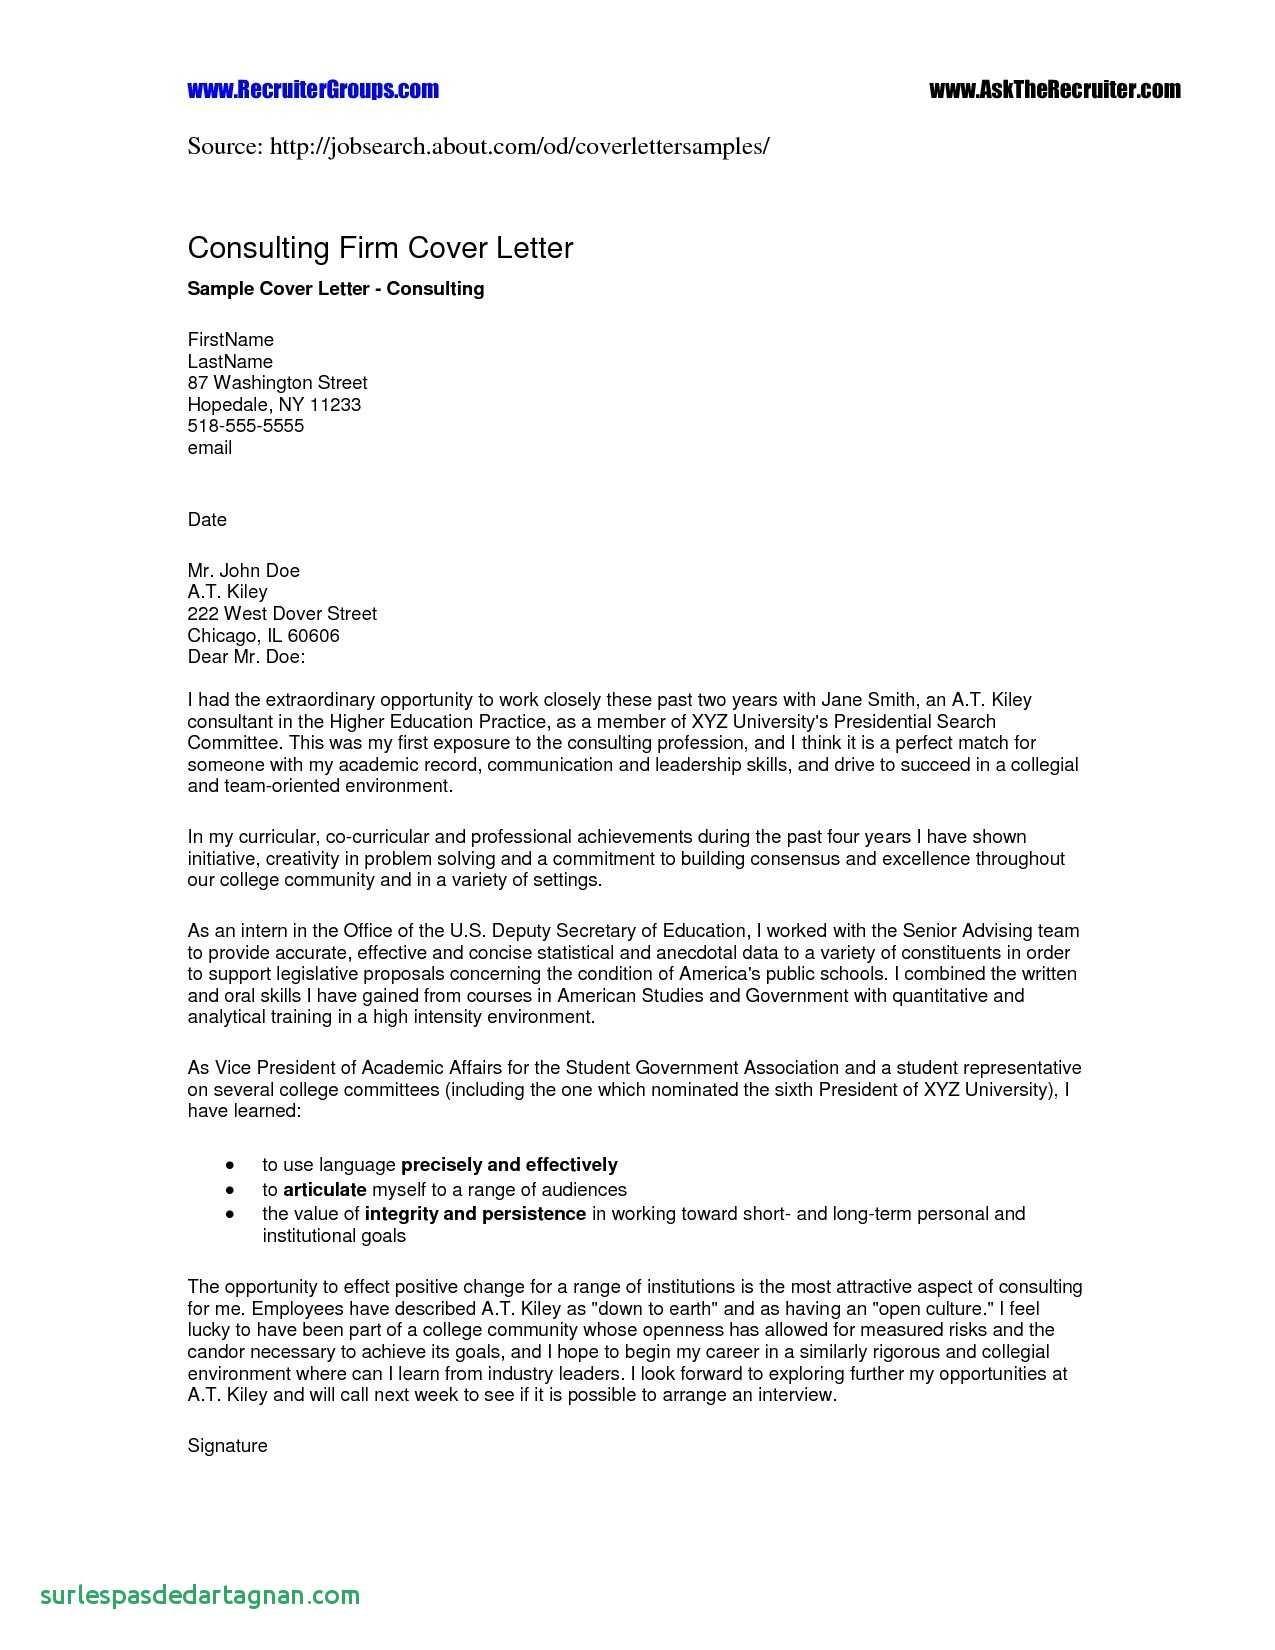 cover letter template for google docs google cover letter template new business letter template google